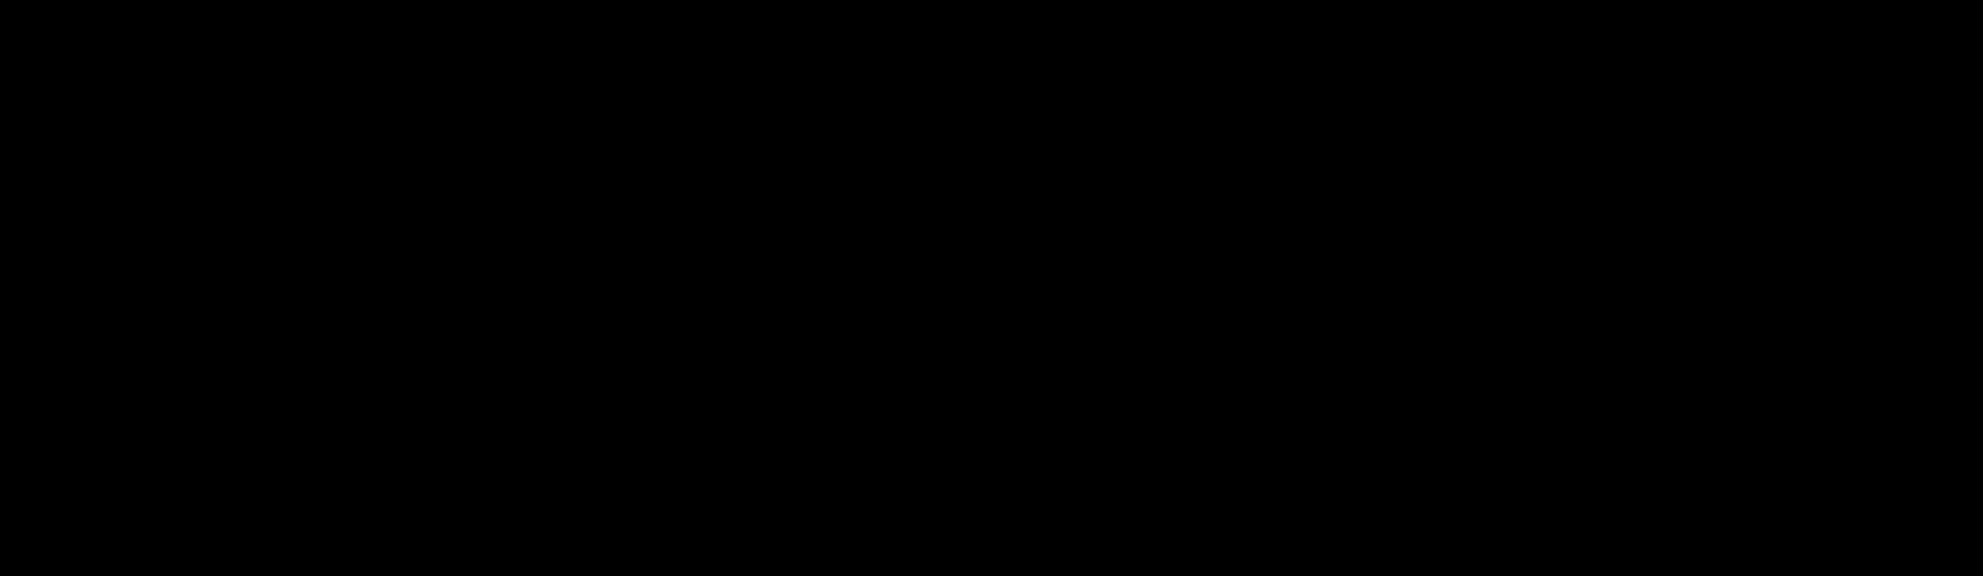 bossabox logo